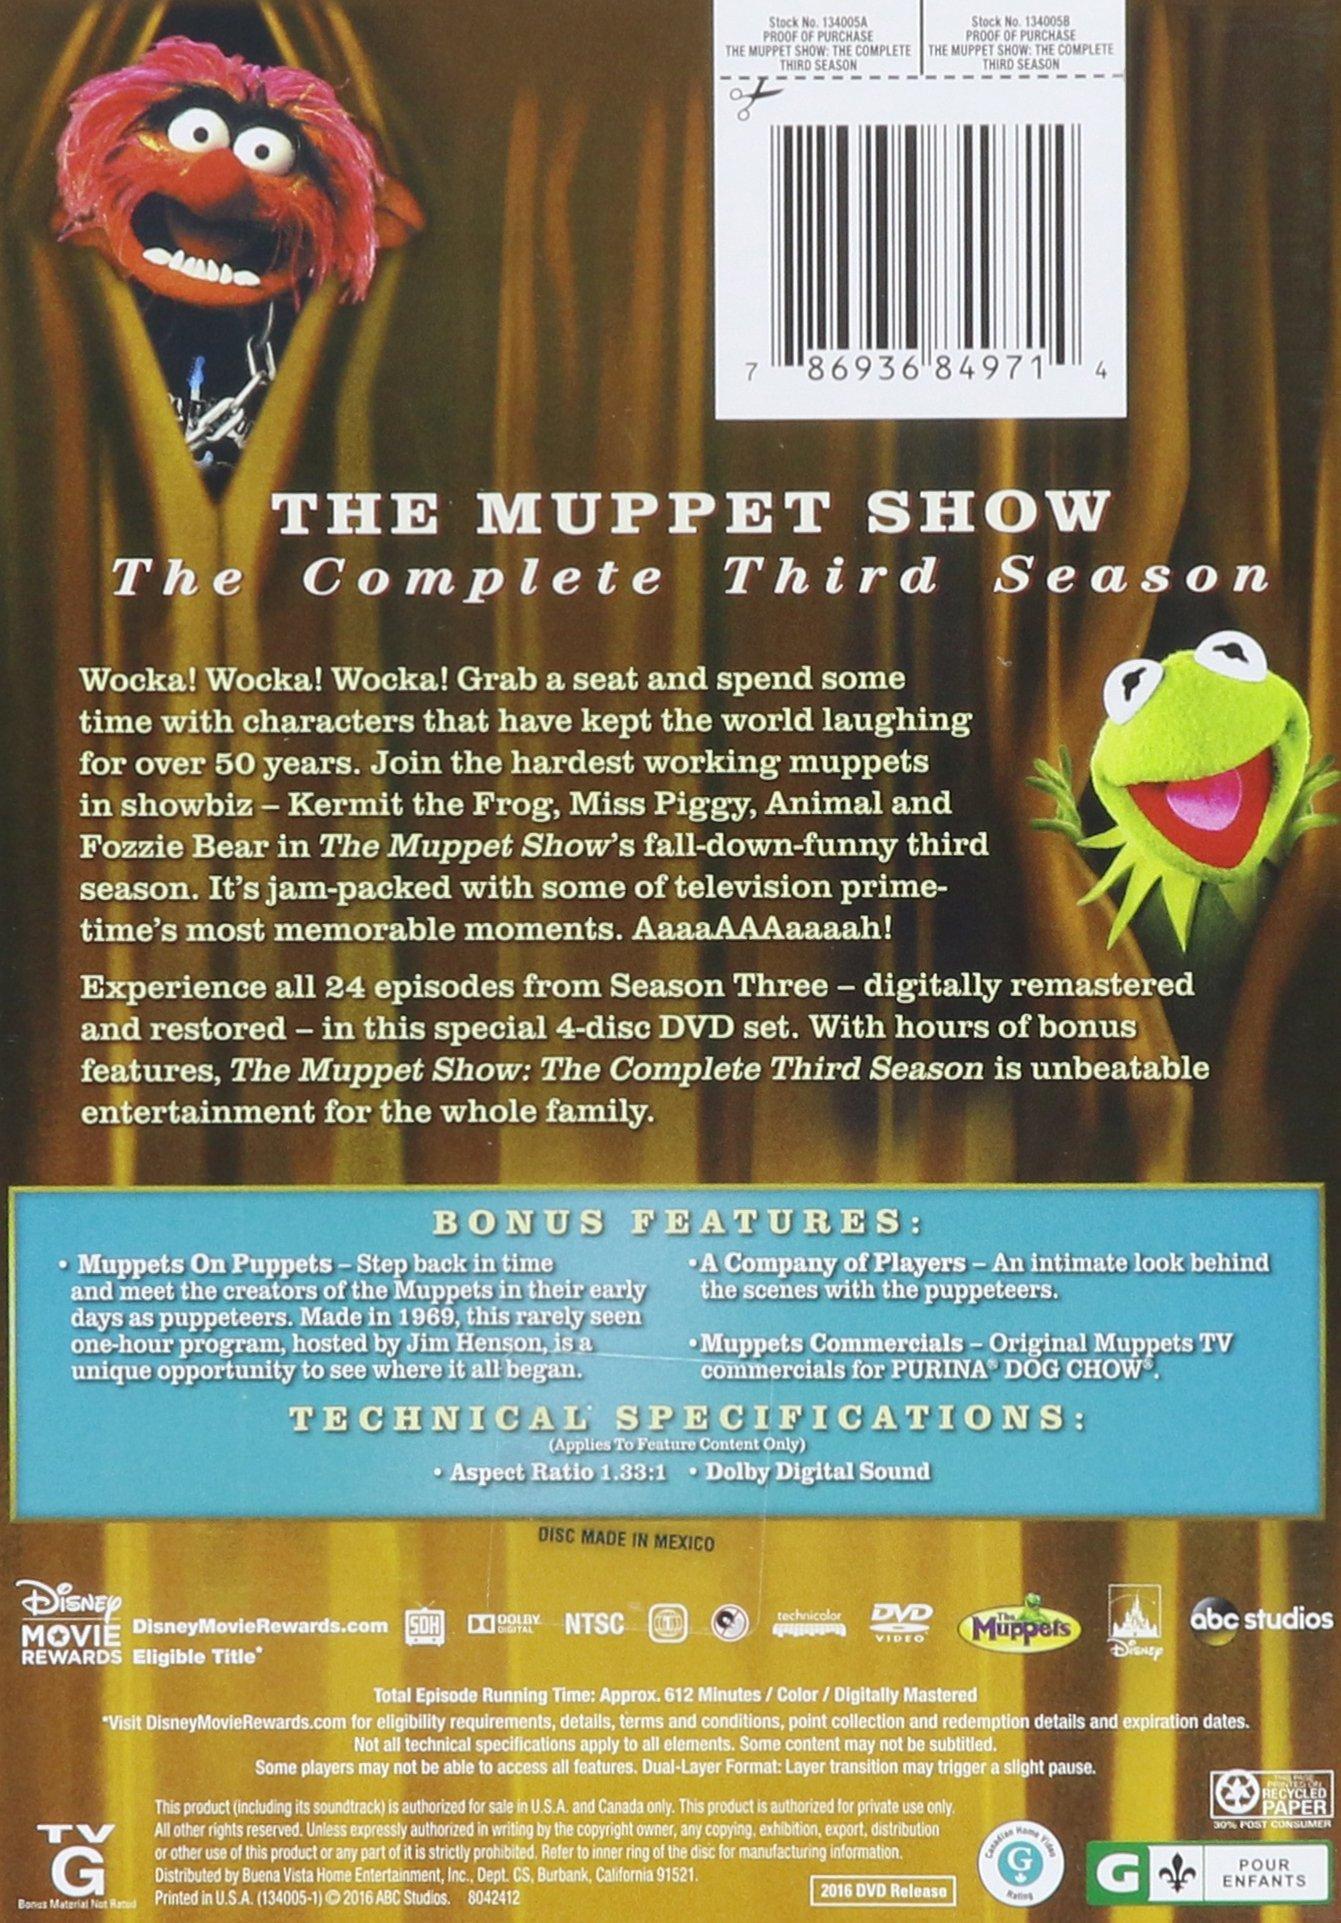 The Muppet Show: Season 3